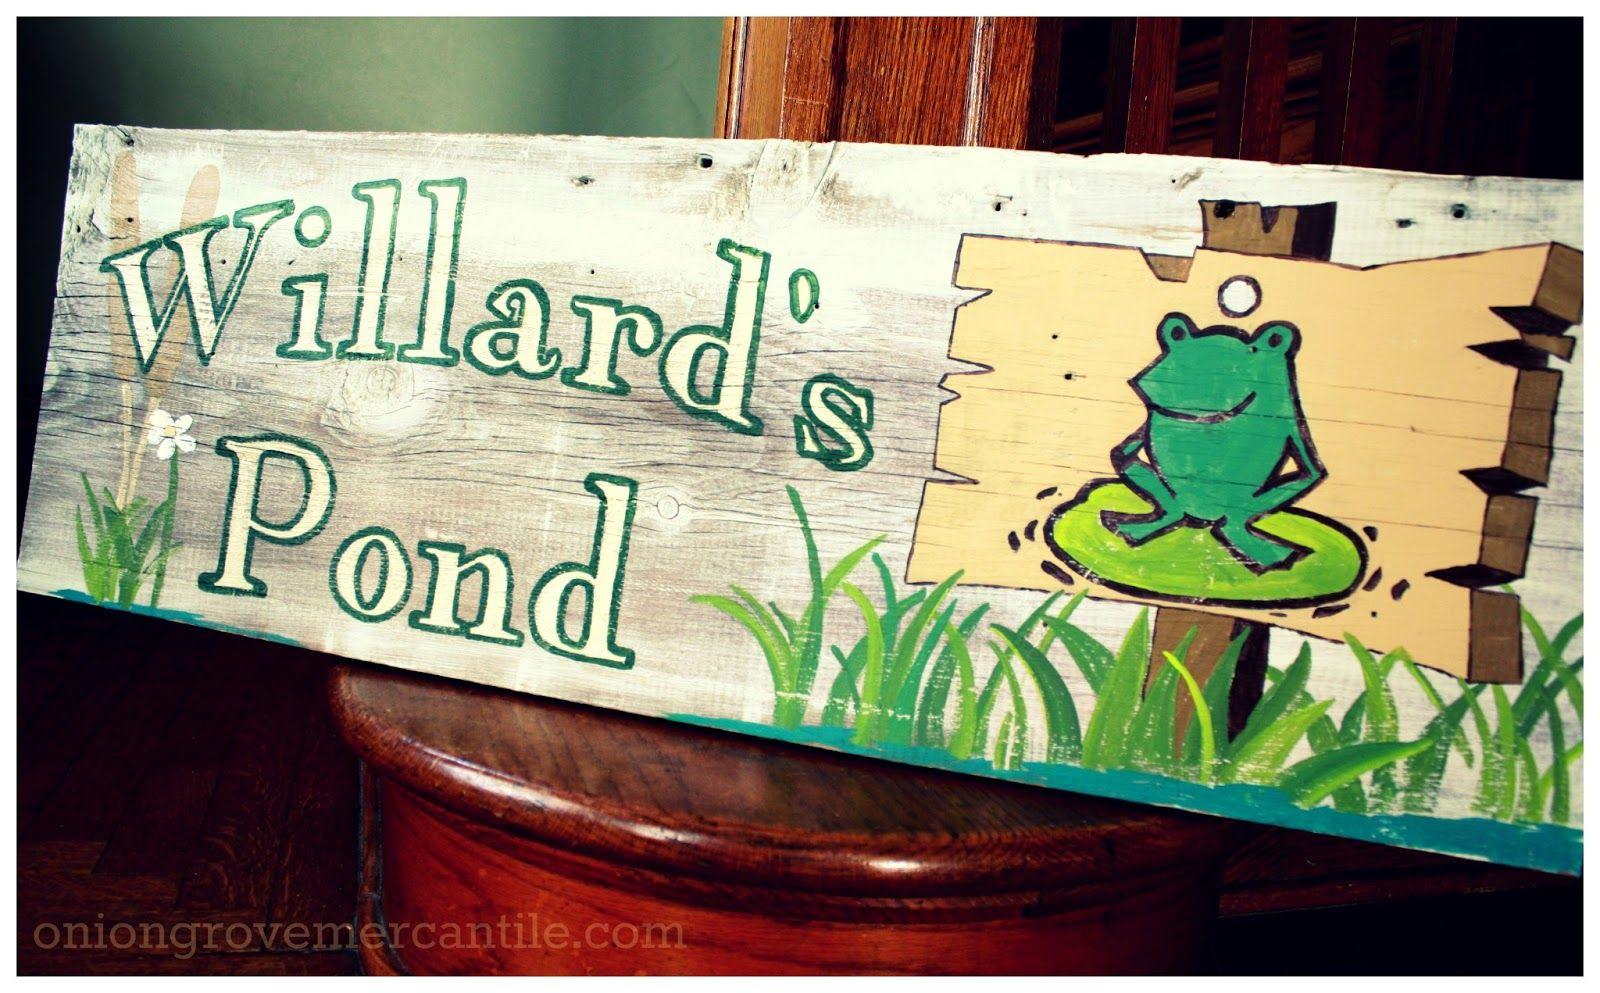 Willard's Pond, Handpainted sign by Onion Grove Mercantile www.oniongrovemercantile.com